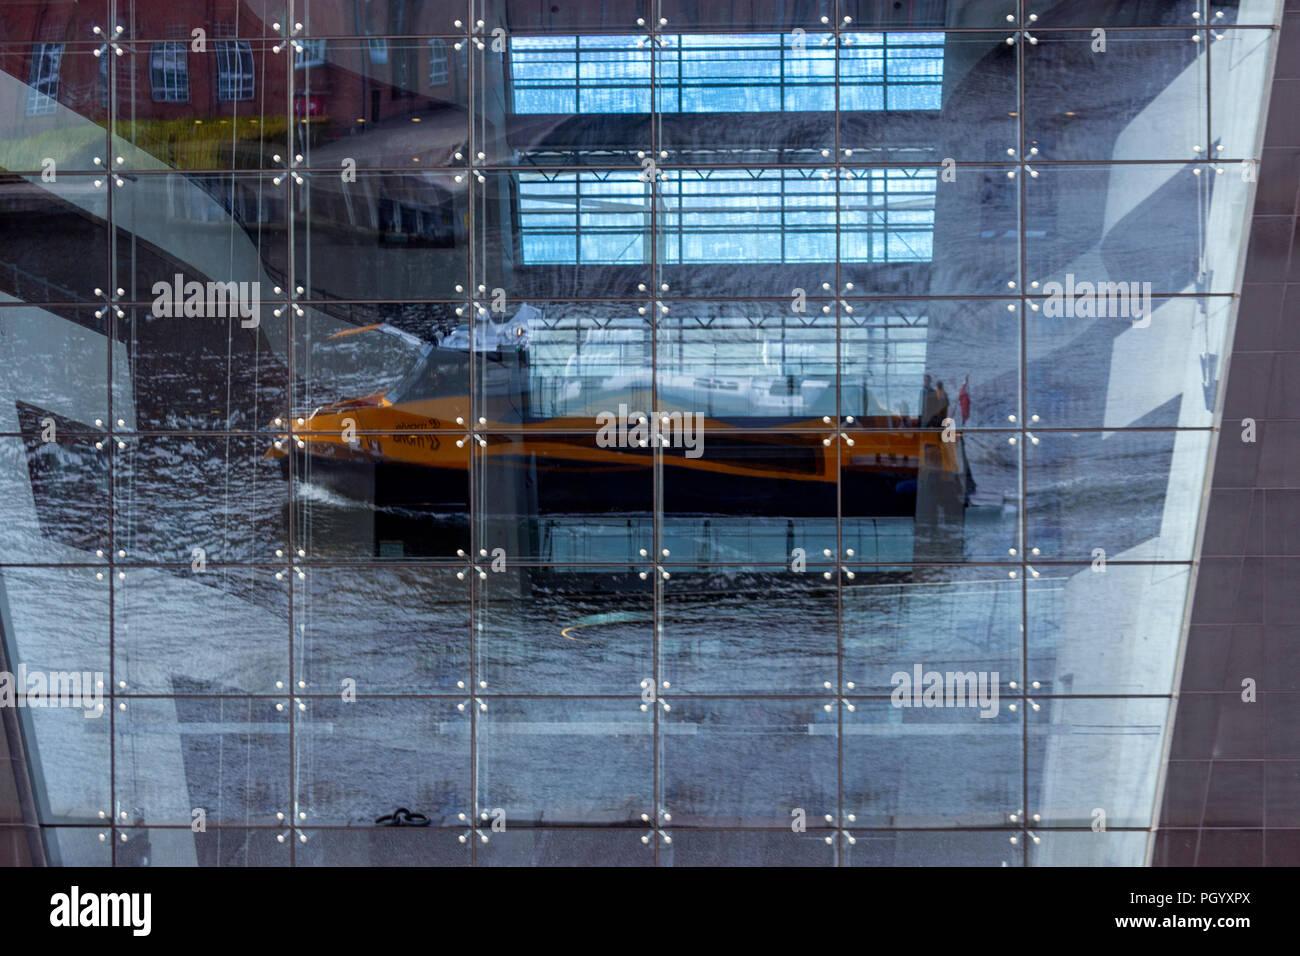 Bus boat reflections from the Royal Danish Library, The Black Diamond library, Designed by architects Schmidt Hammer Lassen, Copenhagen, Denmark. Stock Photo